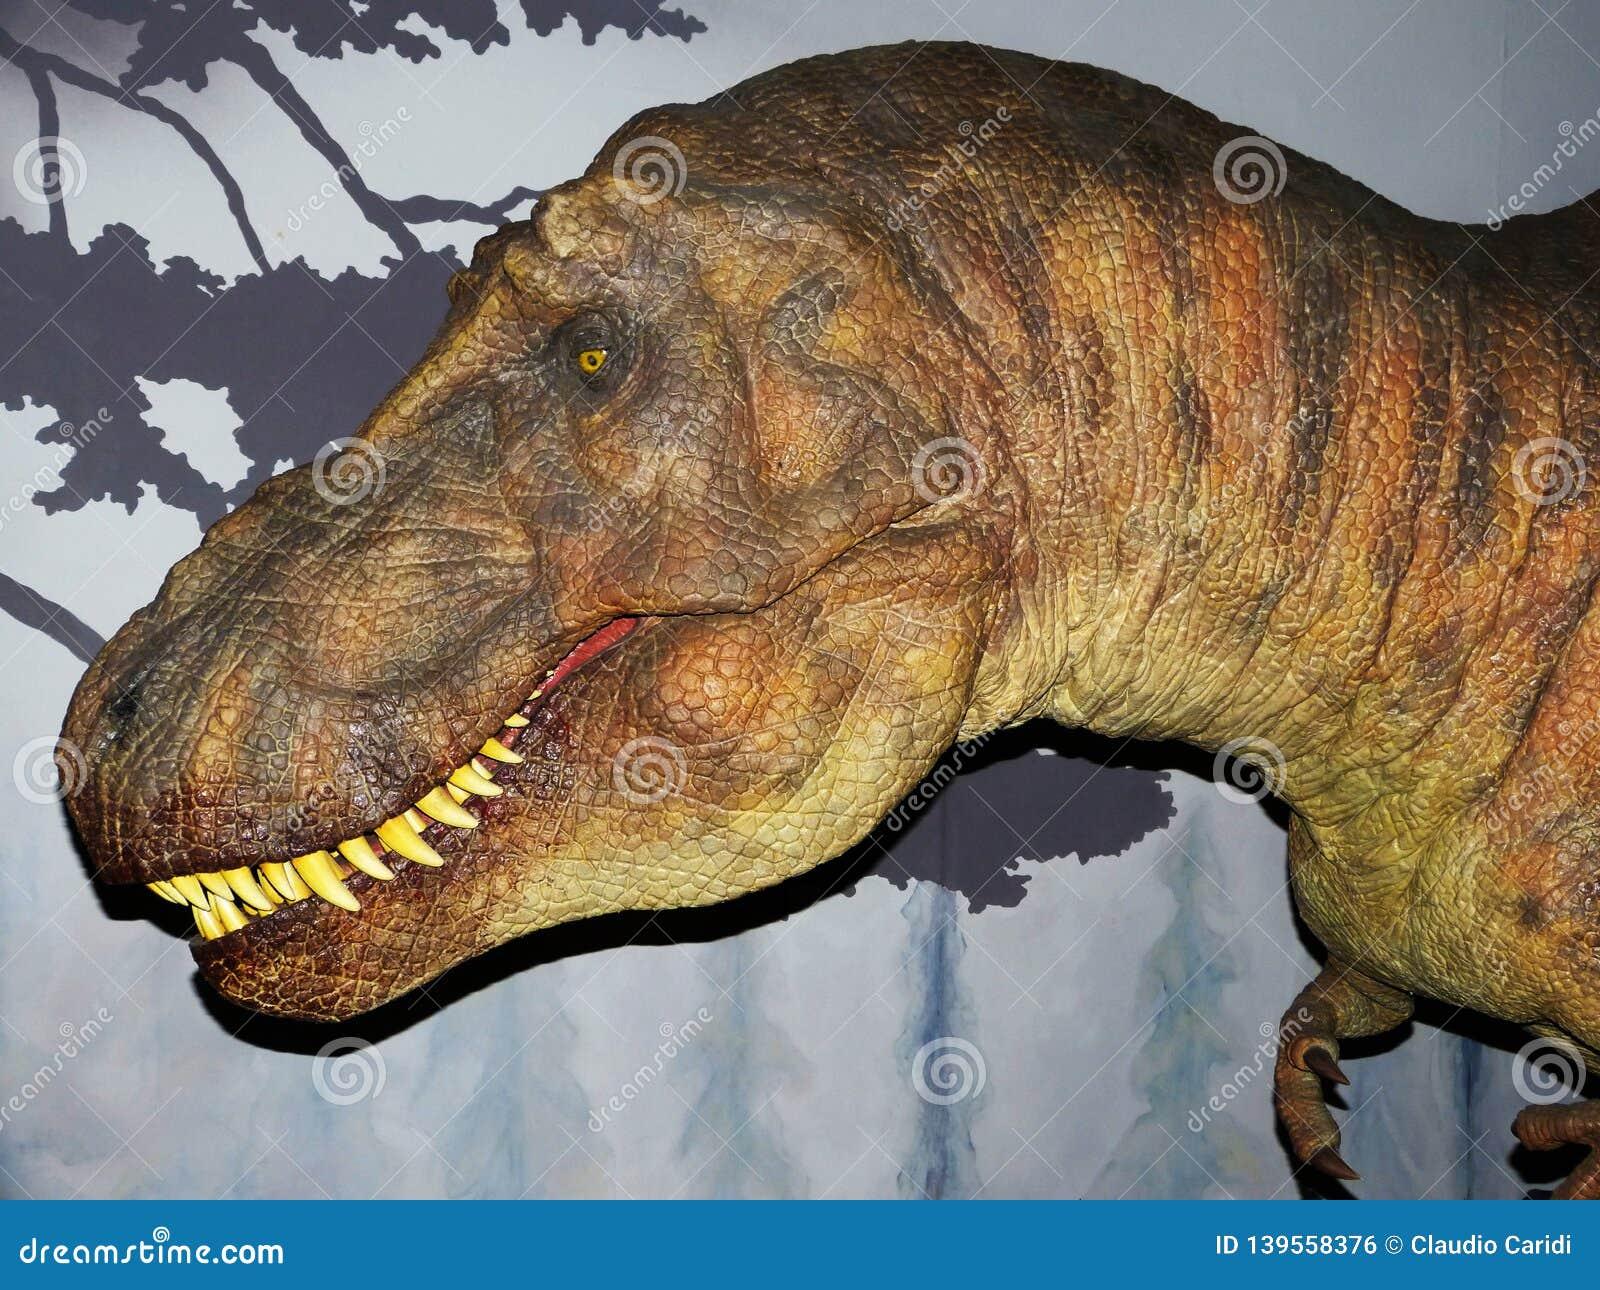 Dinosaur Tyrannosaurus Rex, T-Rex, huge head